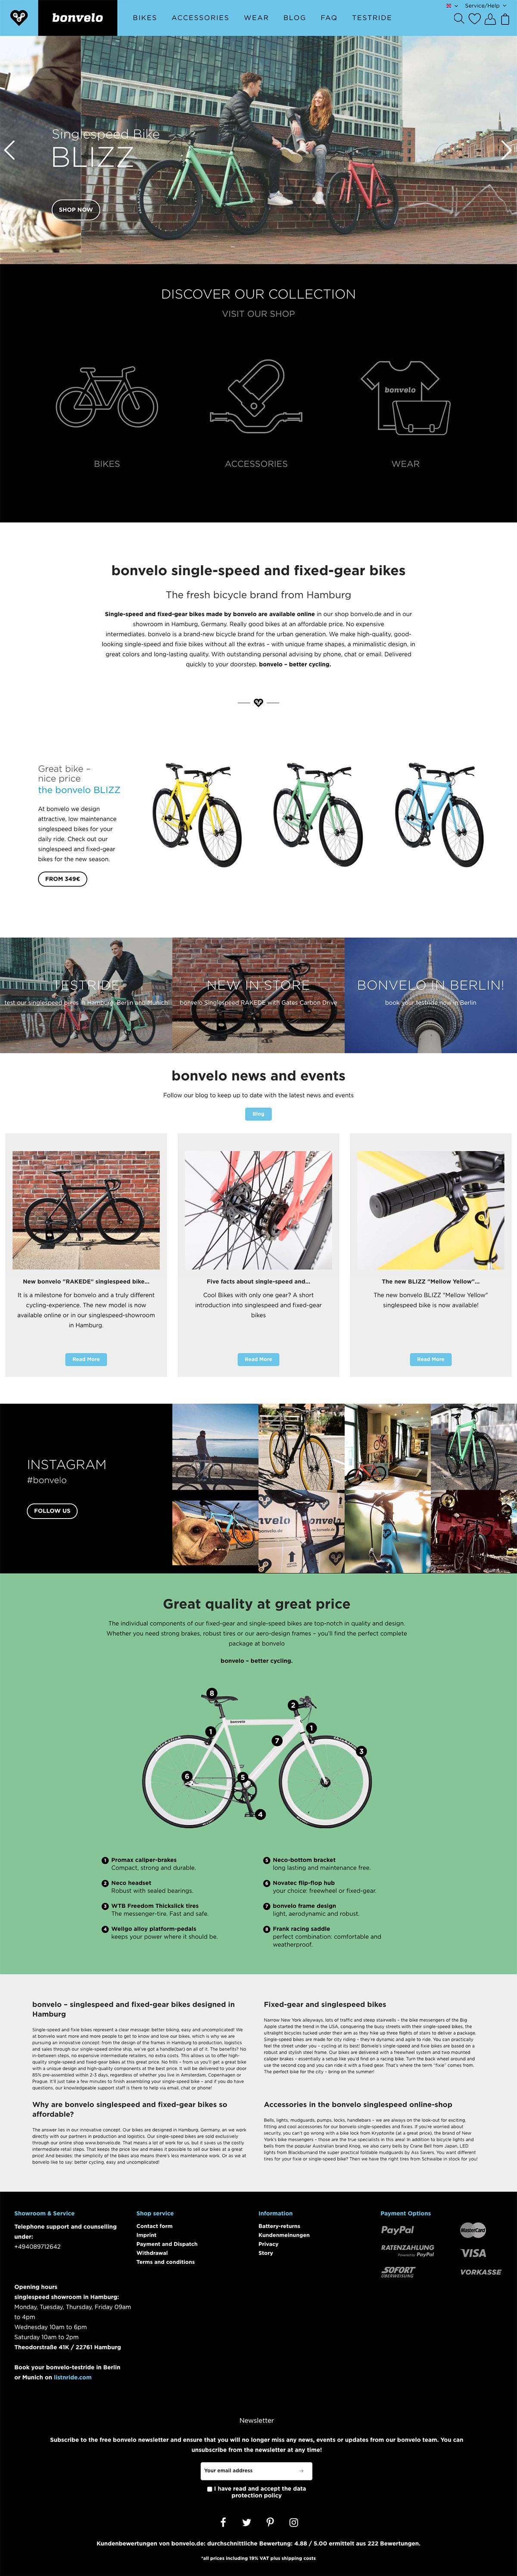 eCommerce website: bonvelo